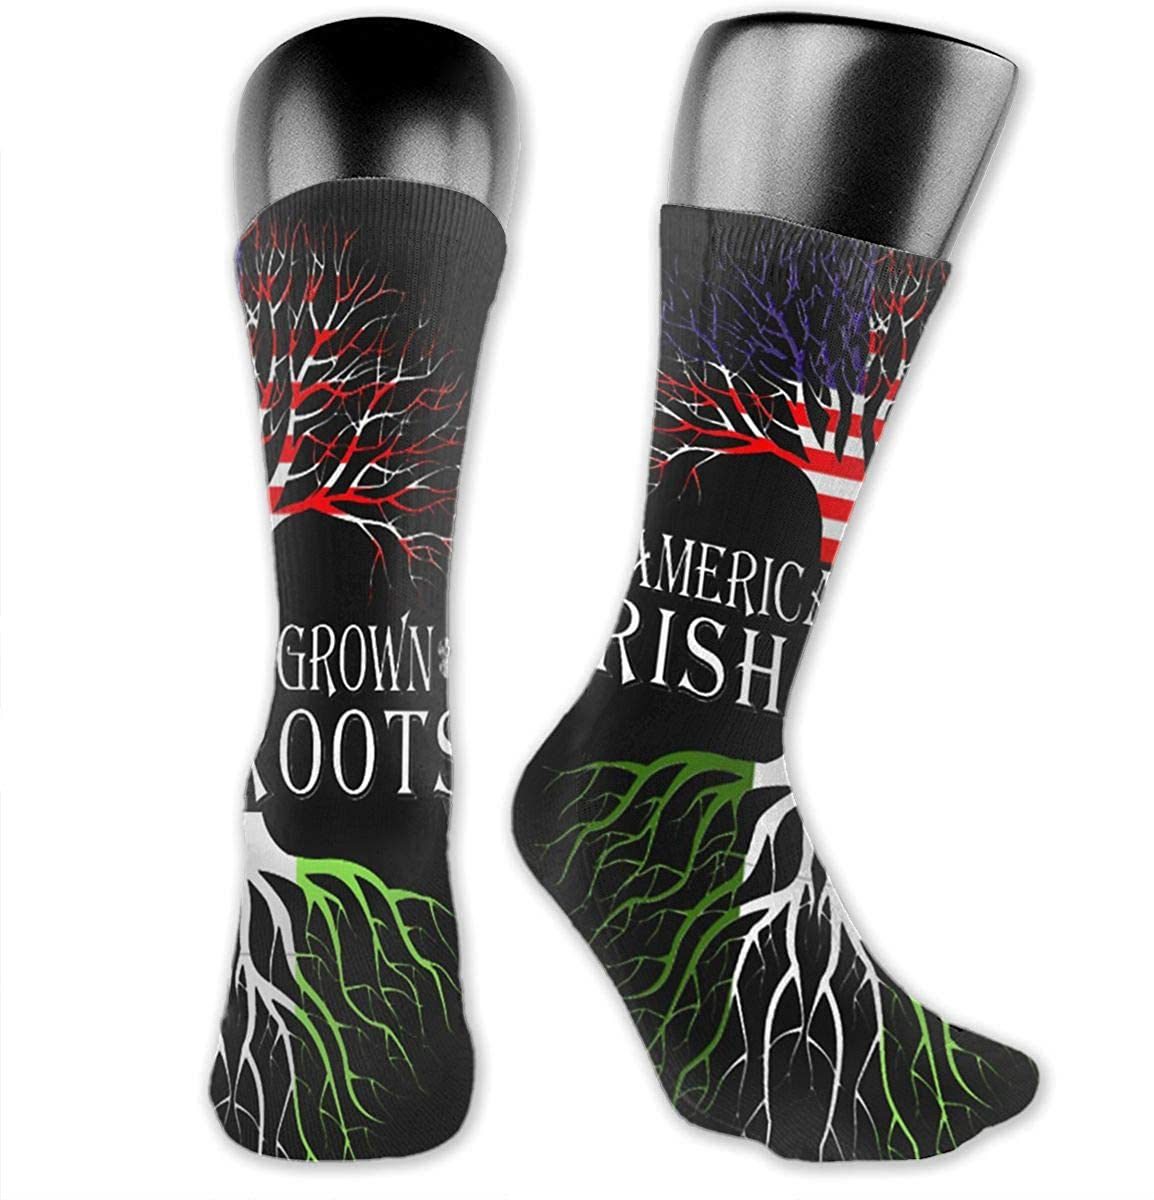 American Grown with Irish Roots Unisex Outdoor Long Socks Sport Athletic Crew Socks Stockings